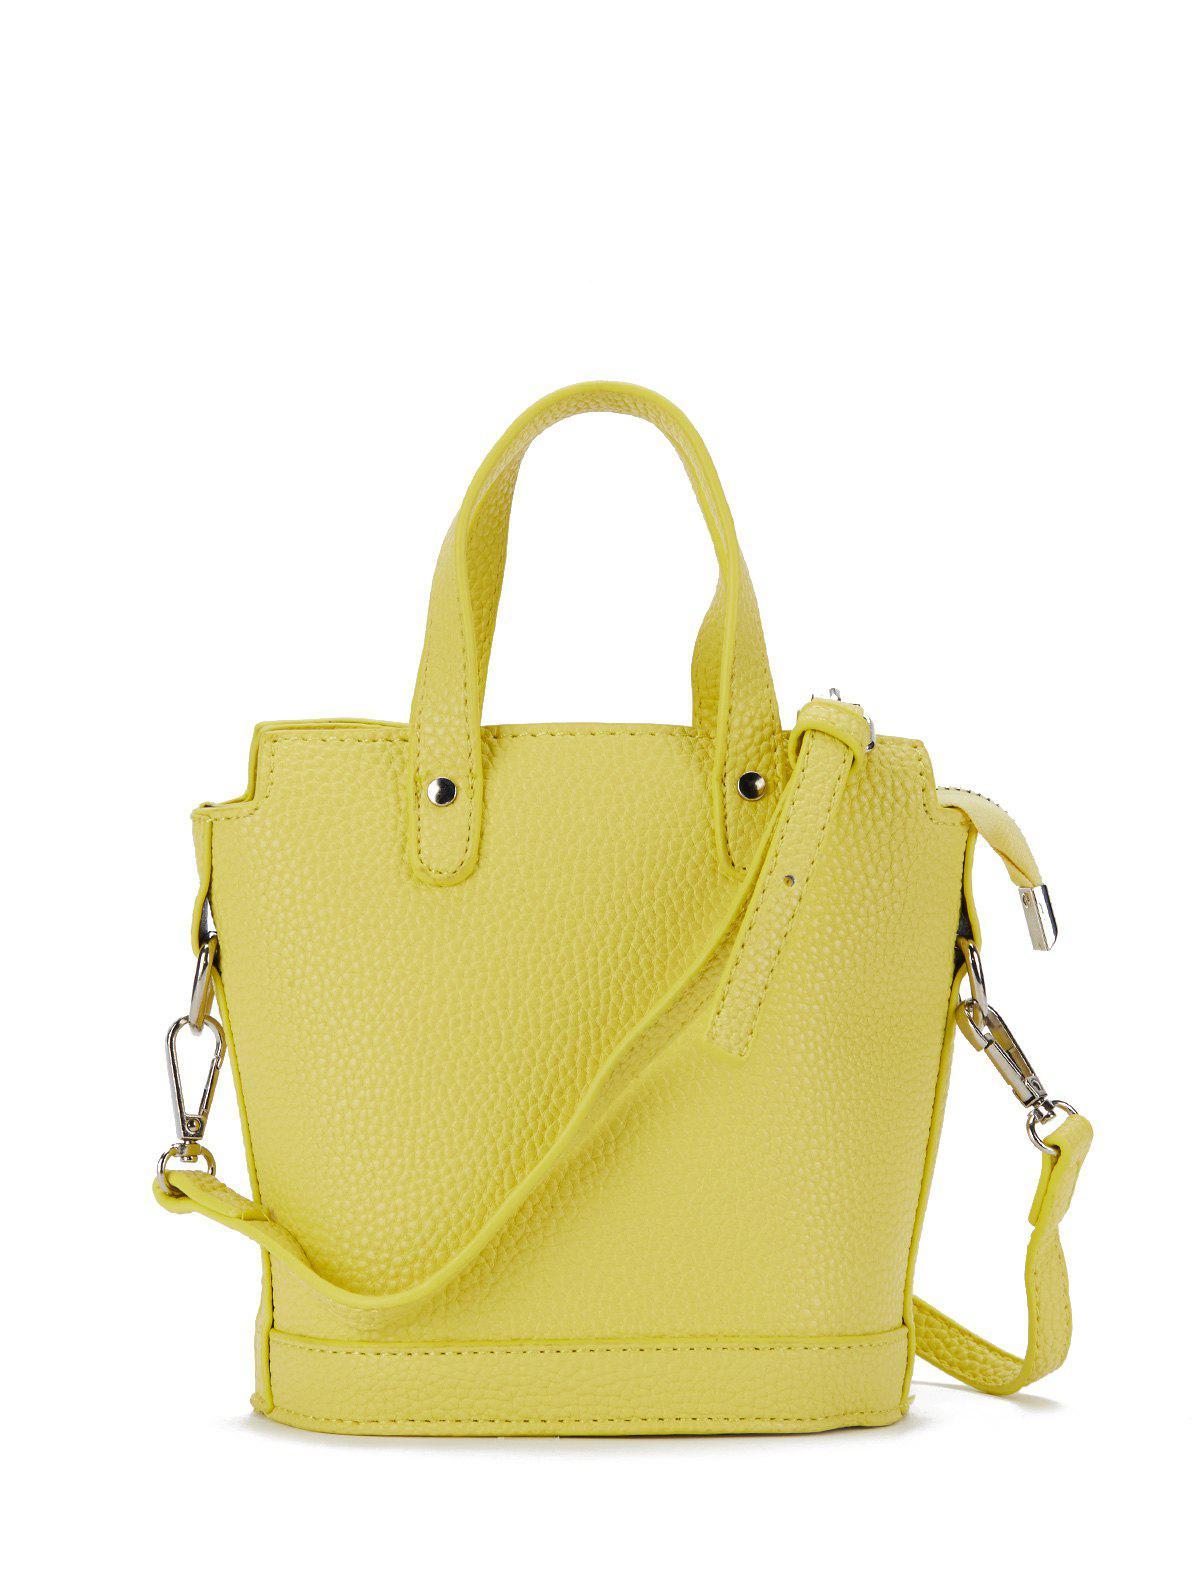 Fashion handbags online retailer 84